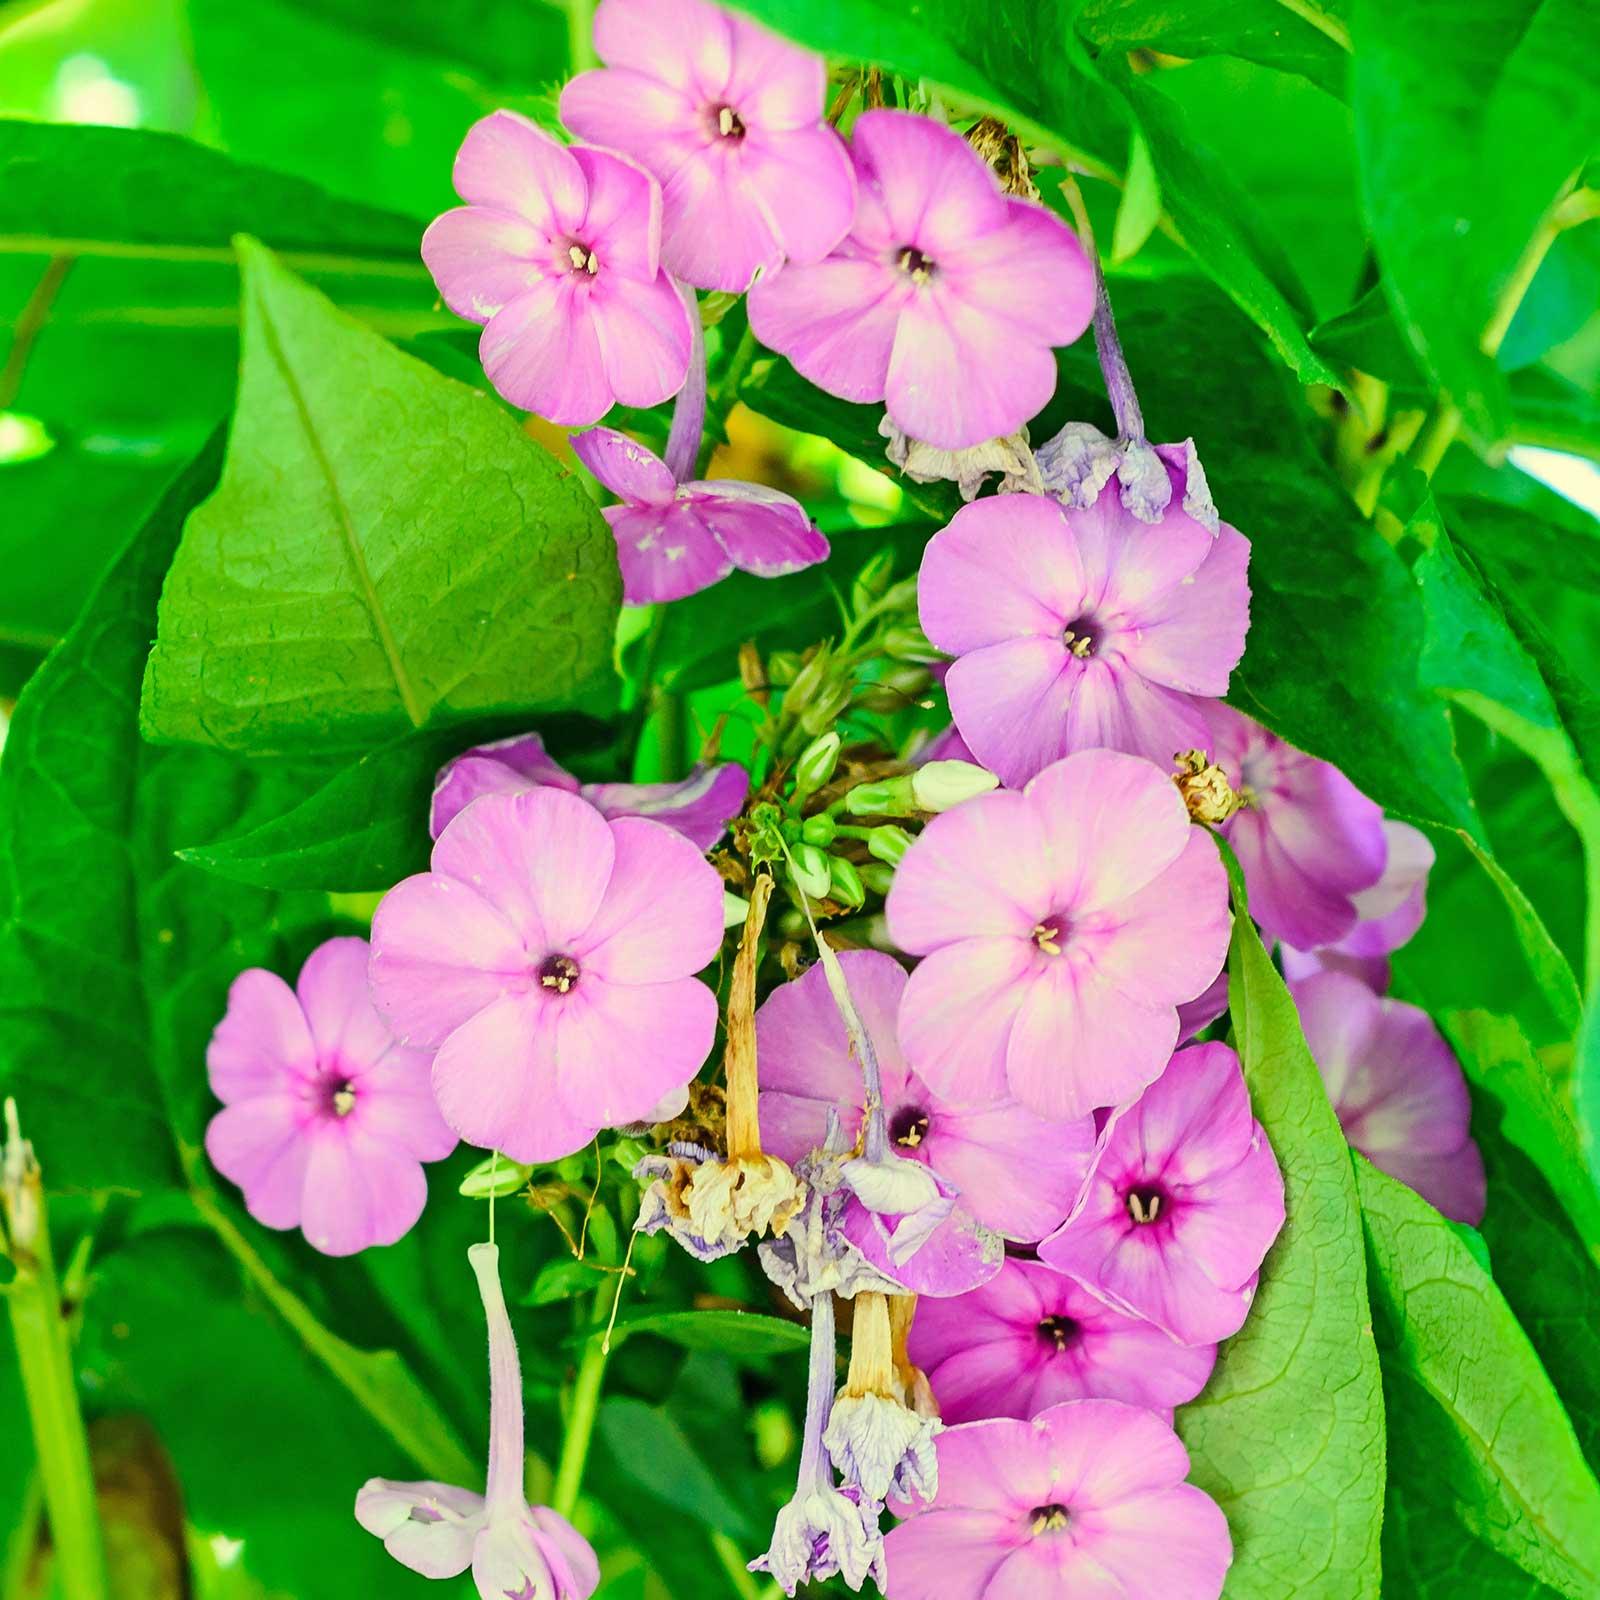 Arabis Compinkie Flower Seeds 500 Seeds Pink Rose Perennial